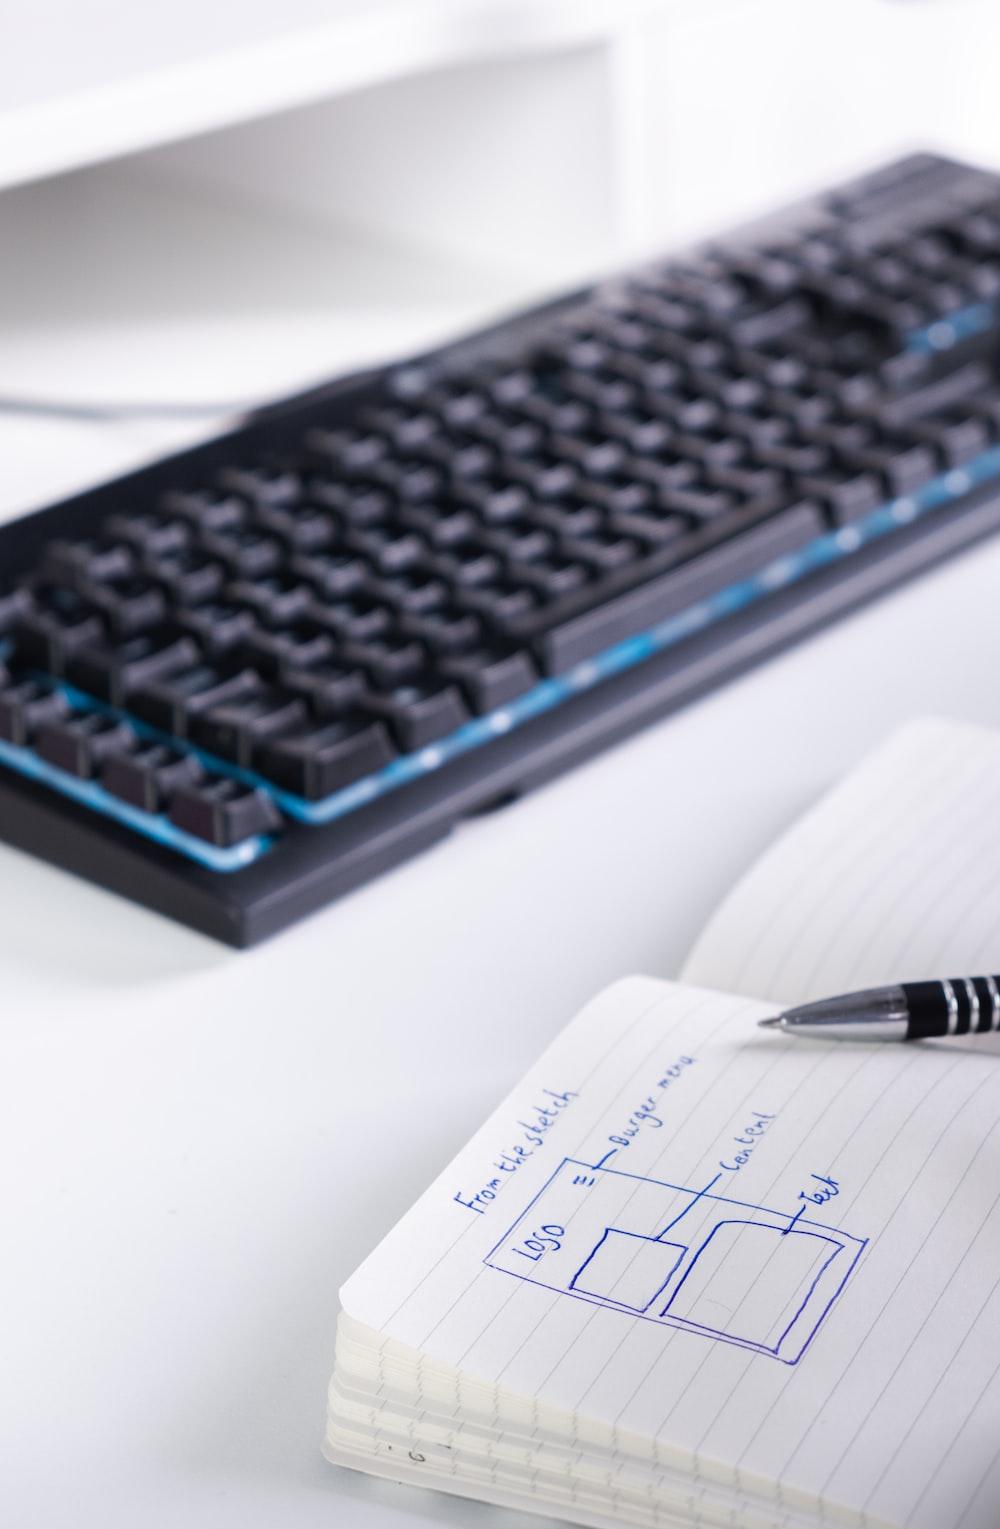 black corded keyboard